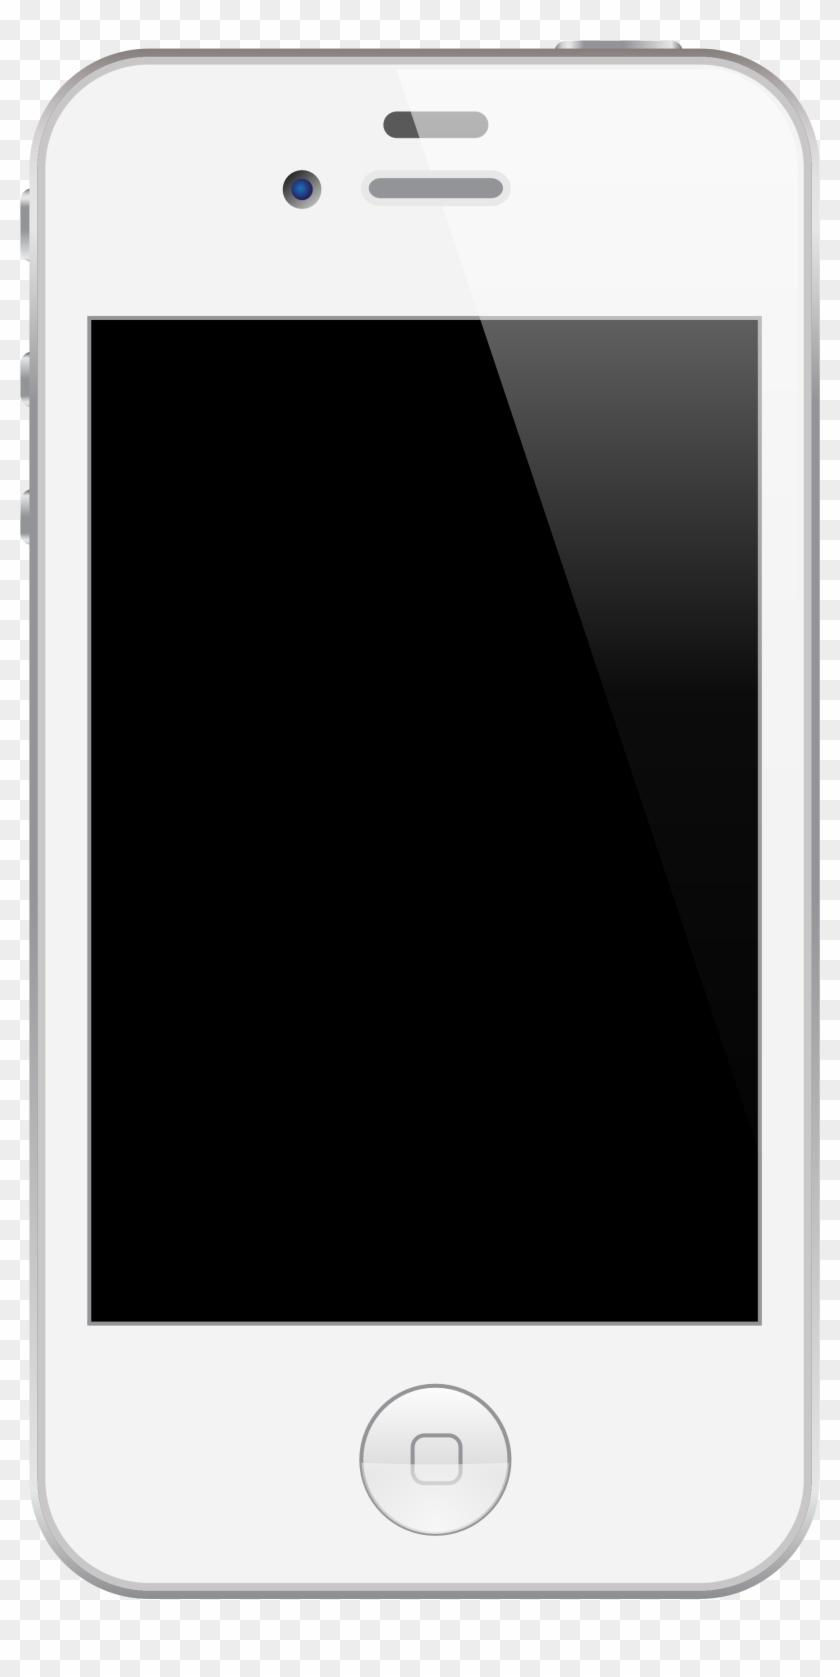 Iphone4 20111028 Phone Icon Iphone Art 1979px 119